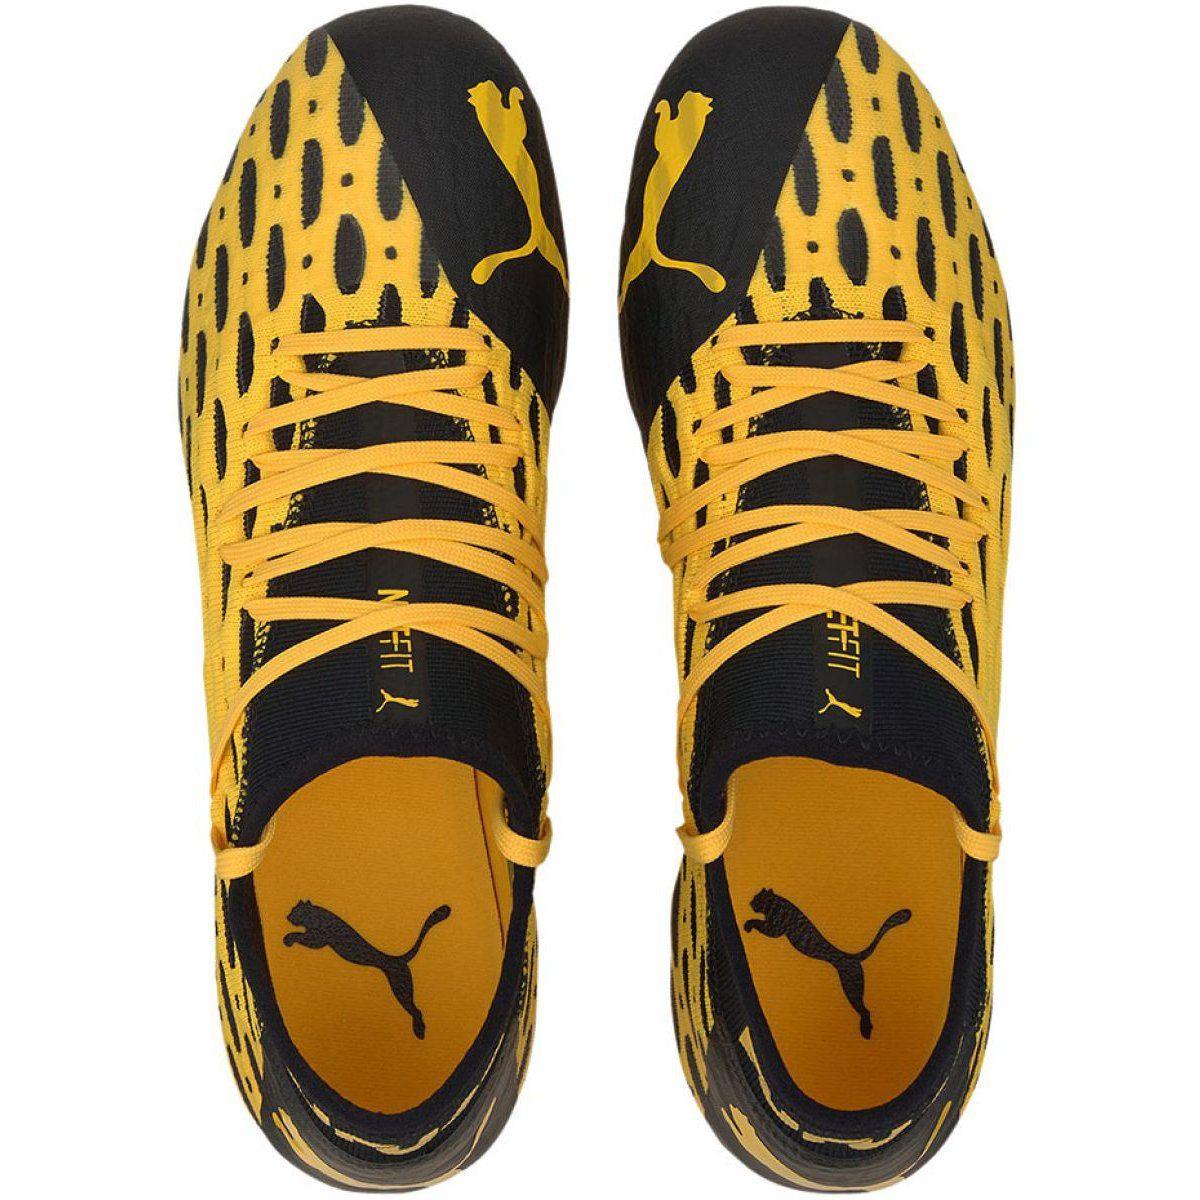 Buty Pilkarskie Puma Future 5 2 Netfit Fg Ag M 105784 03 Zolte Zolte Light Boots Boots Hiking Boots